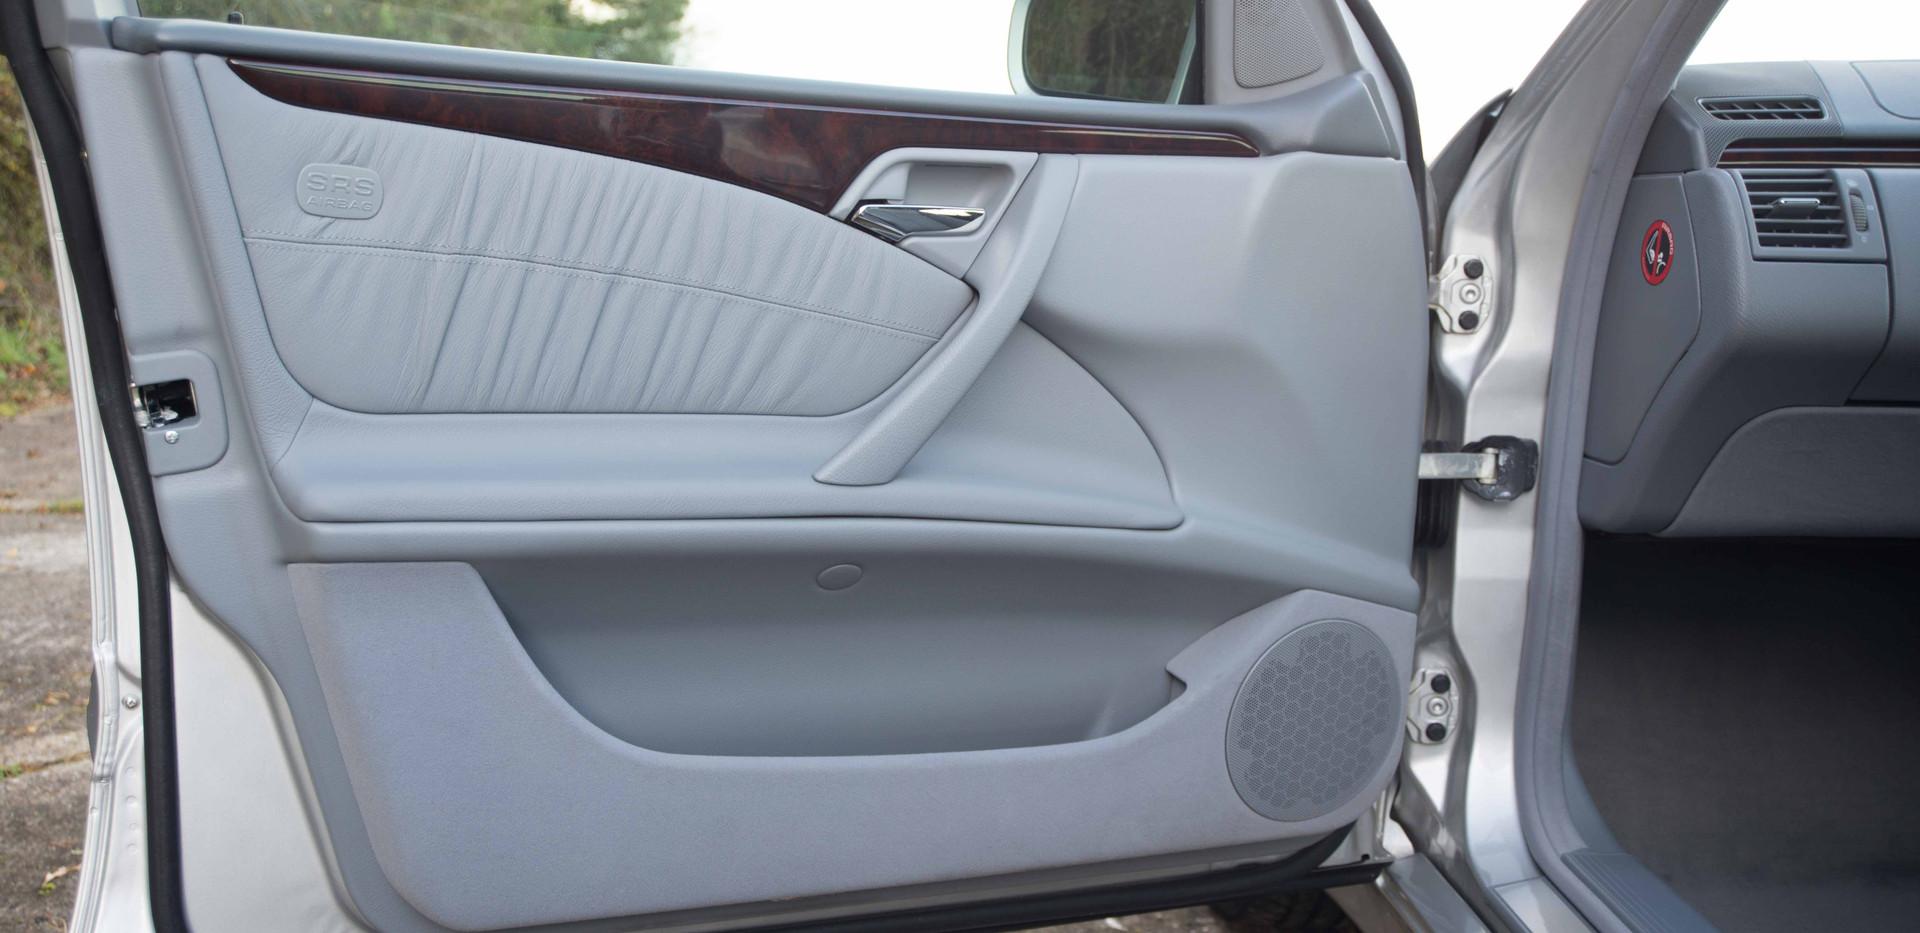 Mercedes E240 For Sale UK London  (71 of